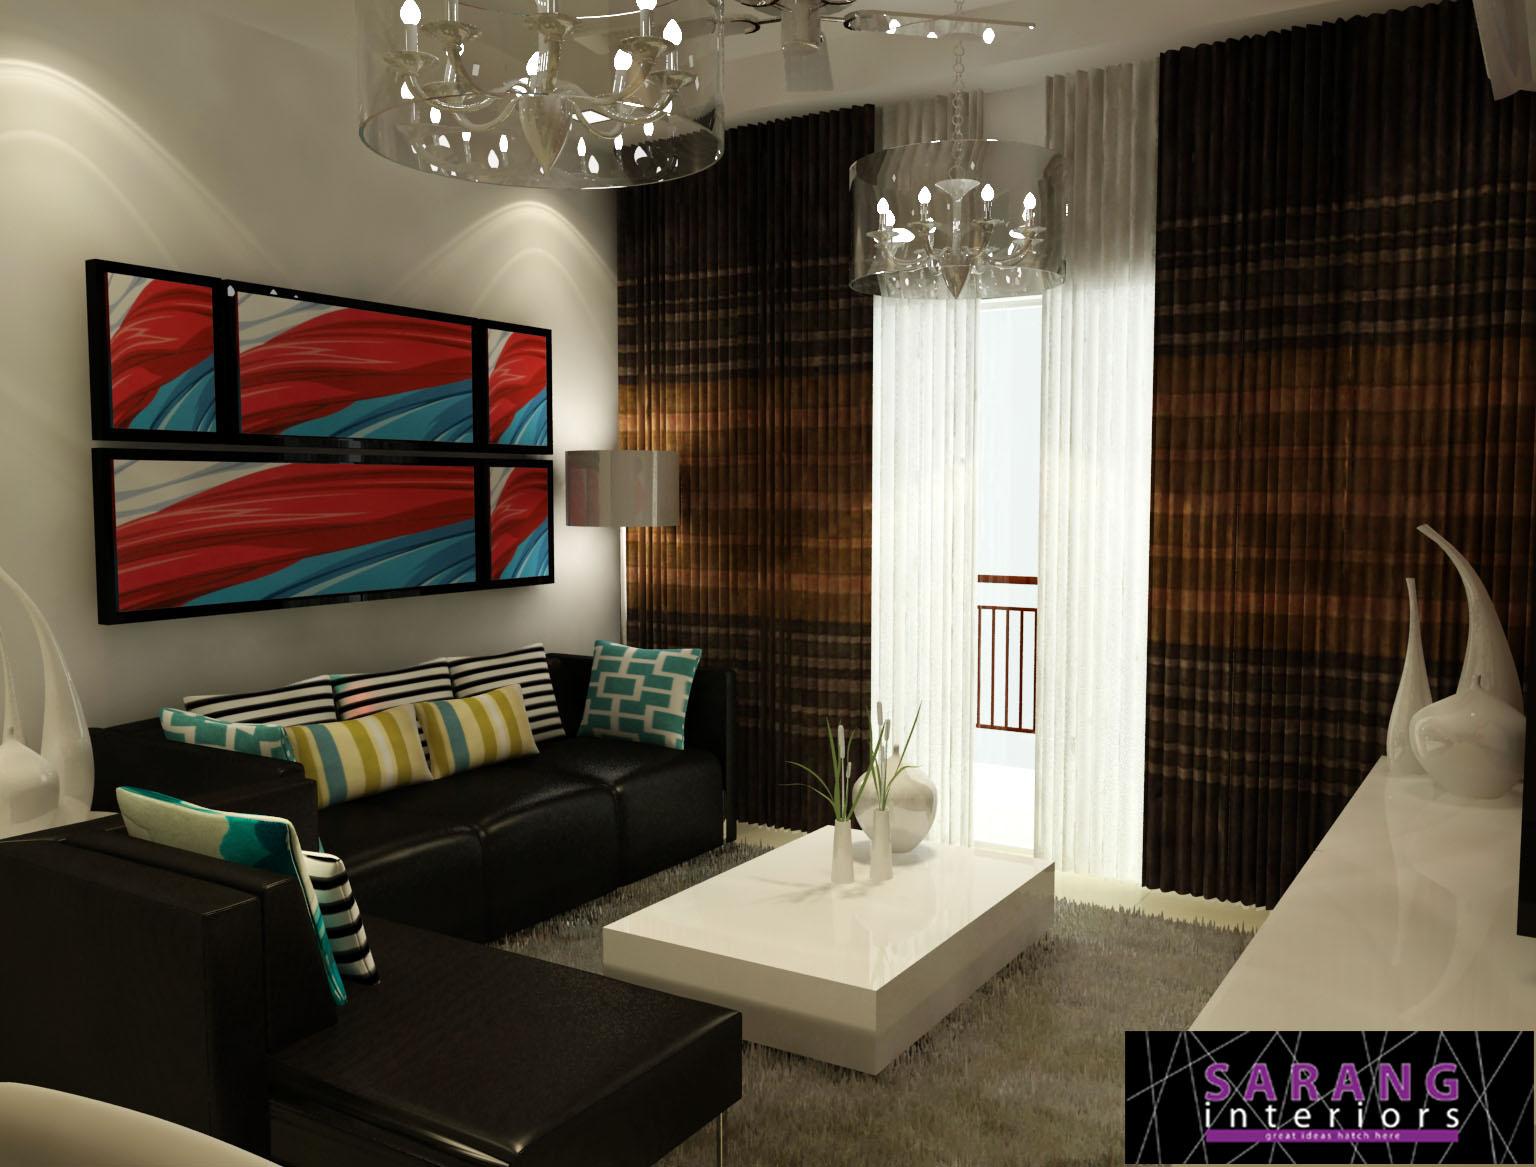 Sarang Interiors Modern Tropical Interior Design By: SARANG INTERIORS: March 2012